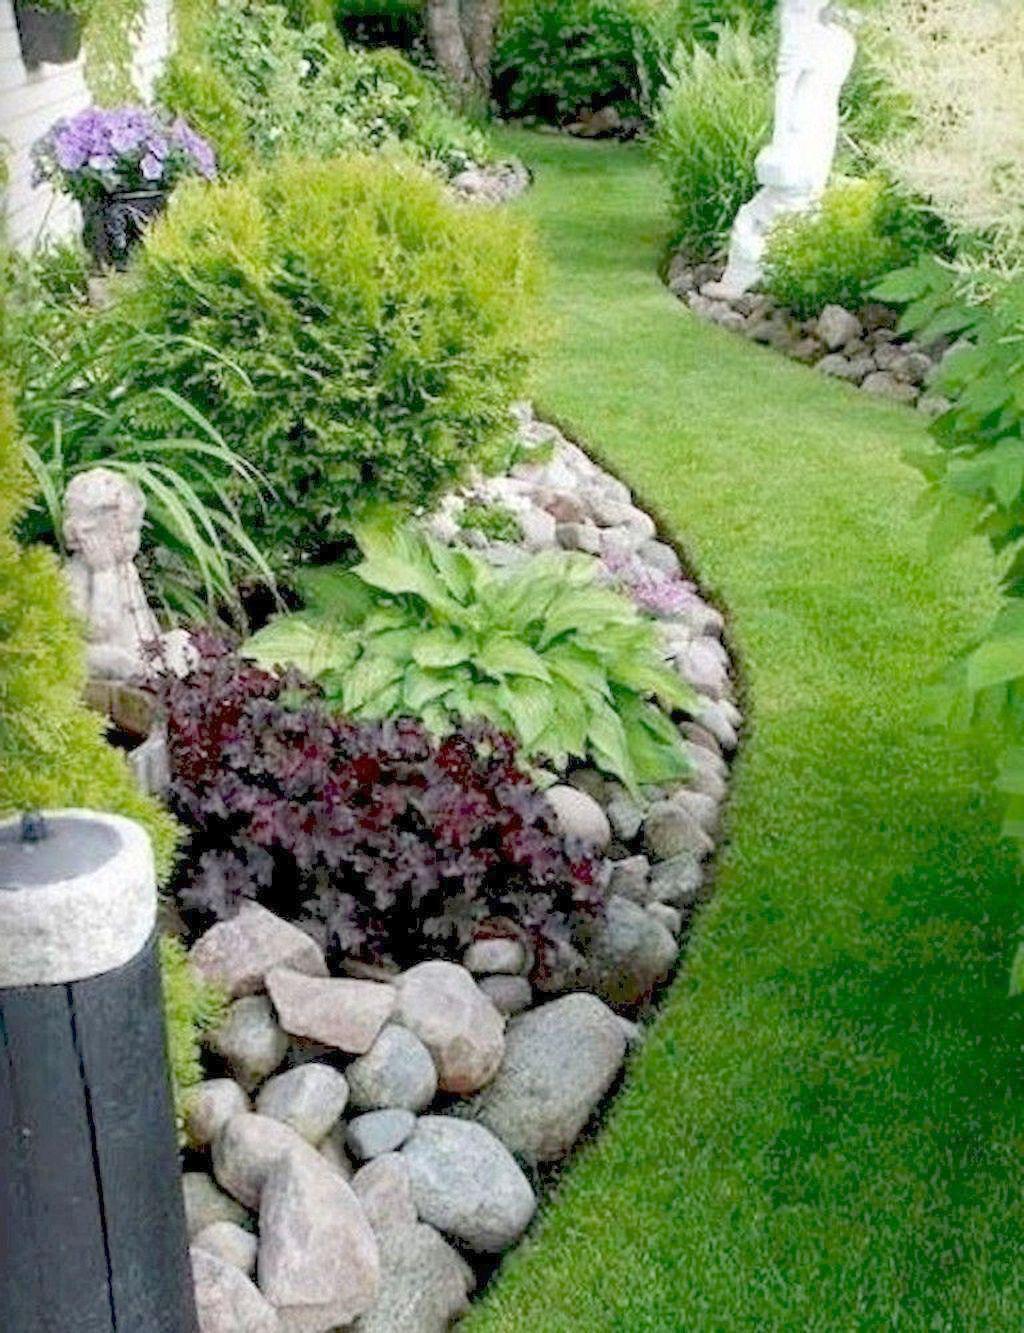 Download Home Design Software Free 3d House Plan And Landscape Design Pc Mac Home Design Programs Home Design Software Free Home Design Software